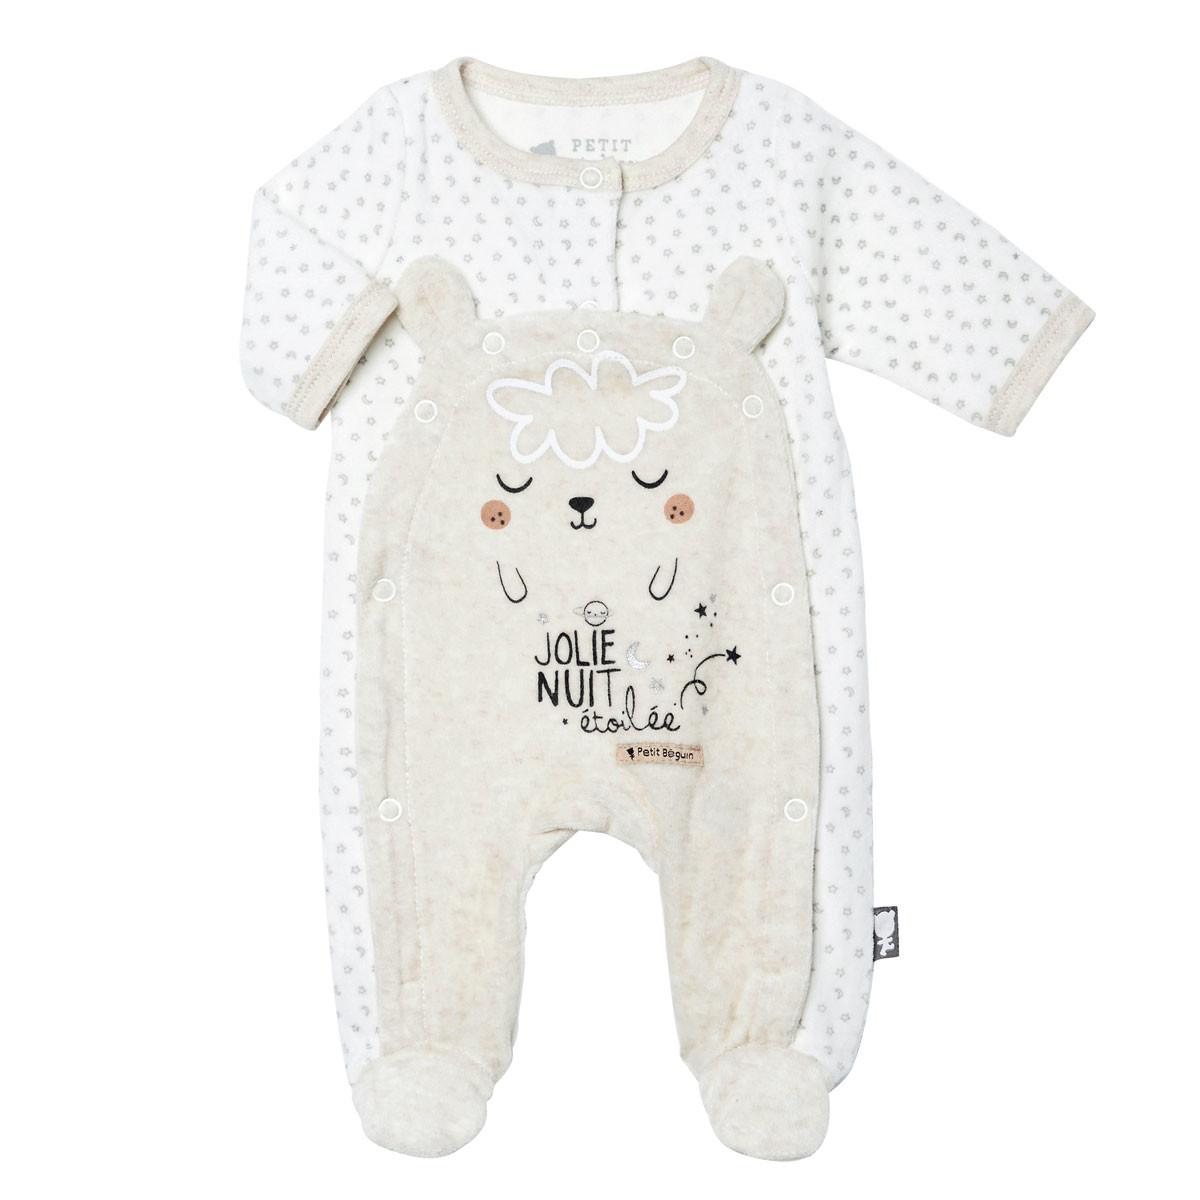 Pyjama bébé velours mixte Nuit Etoilée